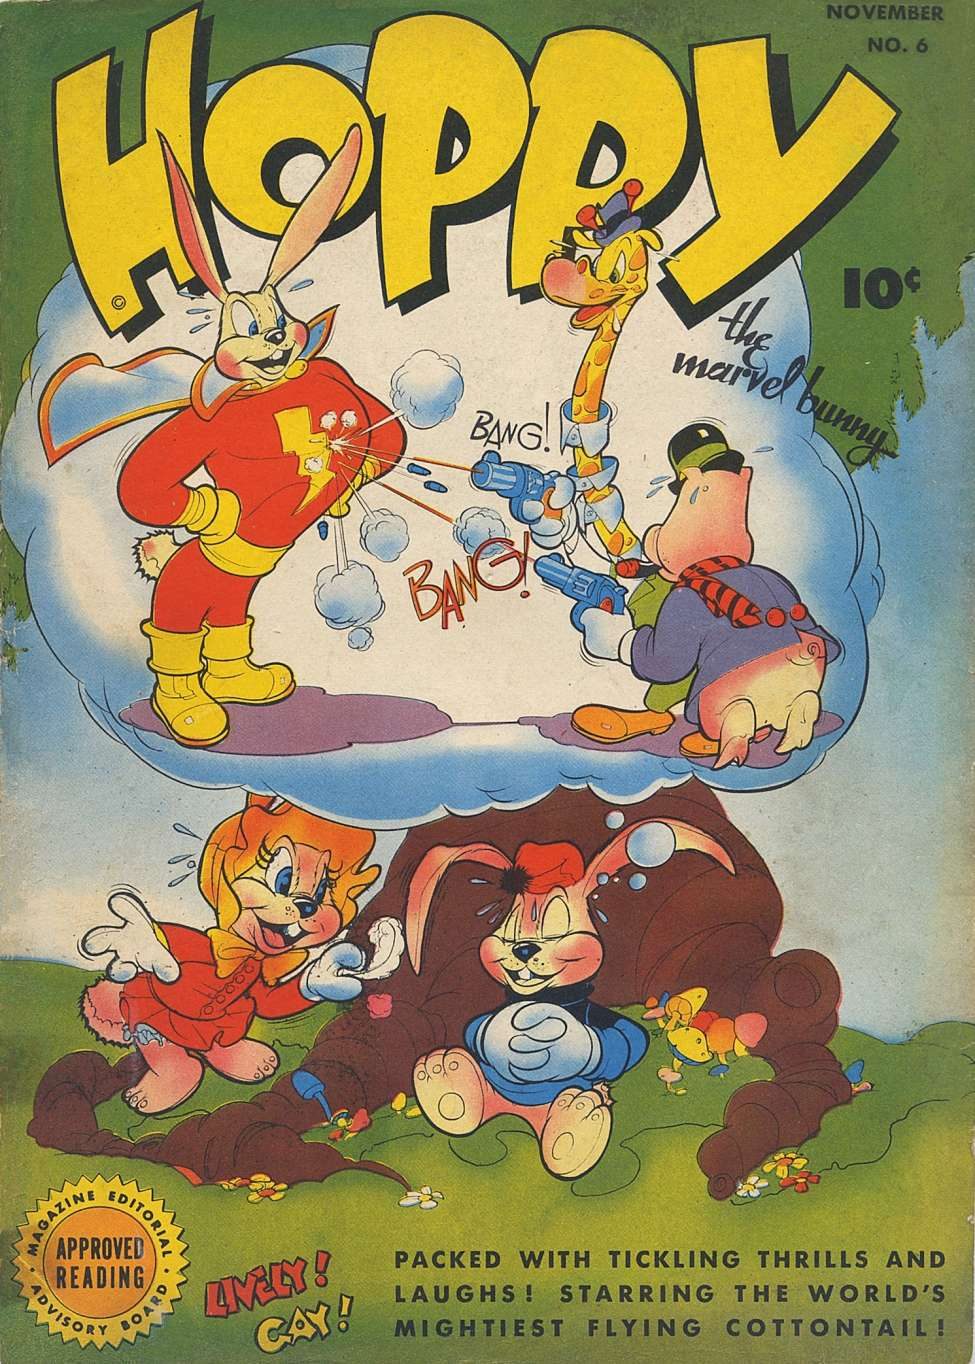 Comic Book Cover For Hoppy the Marvel Bunny #6